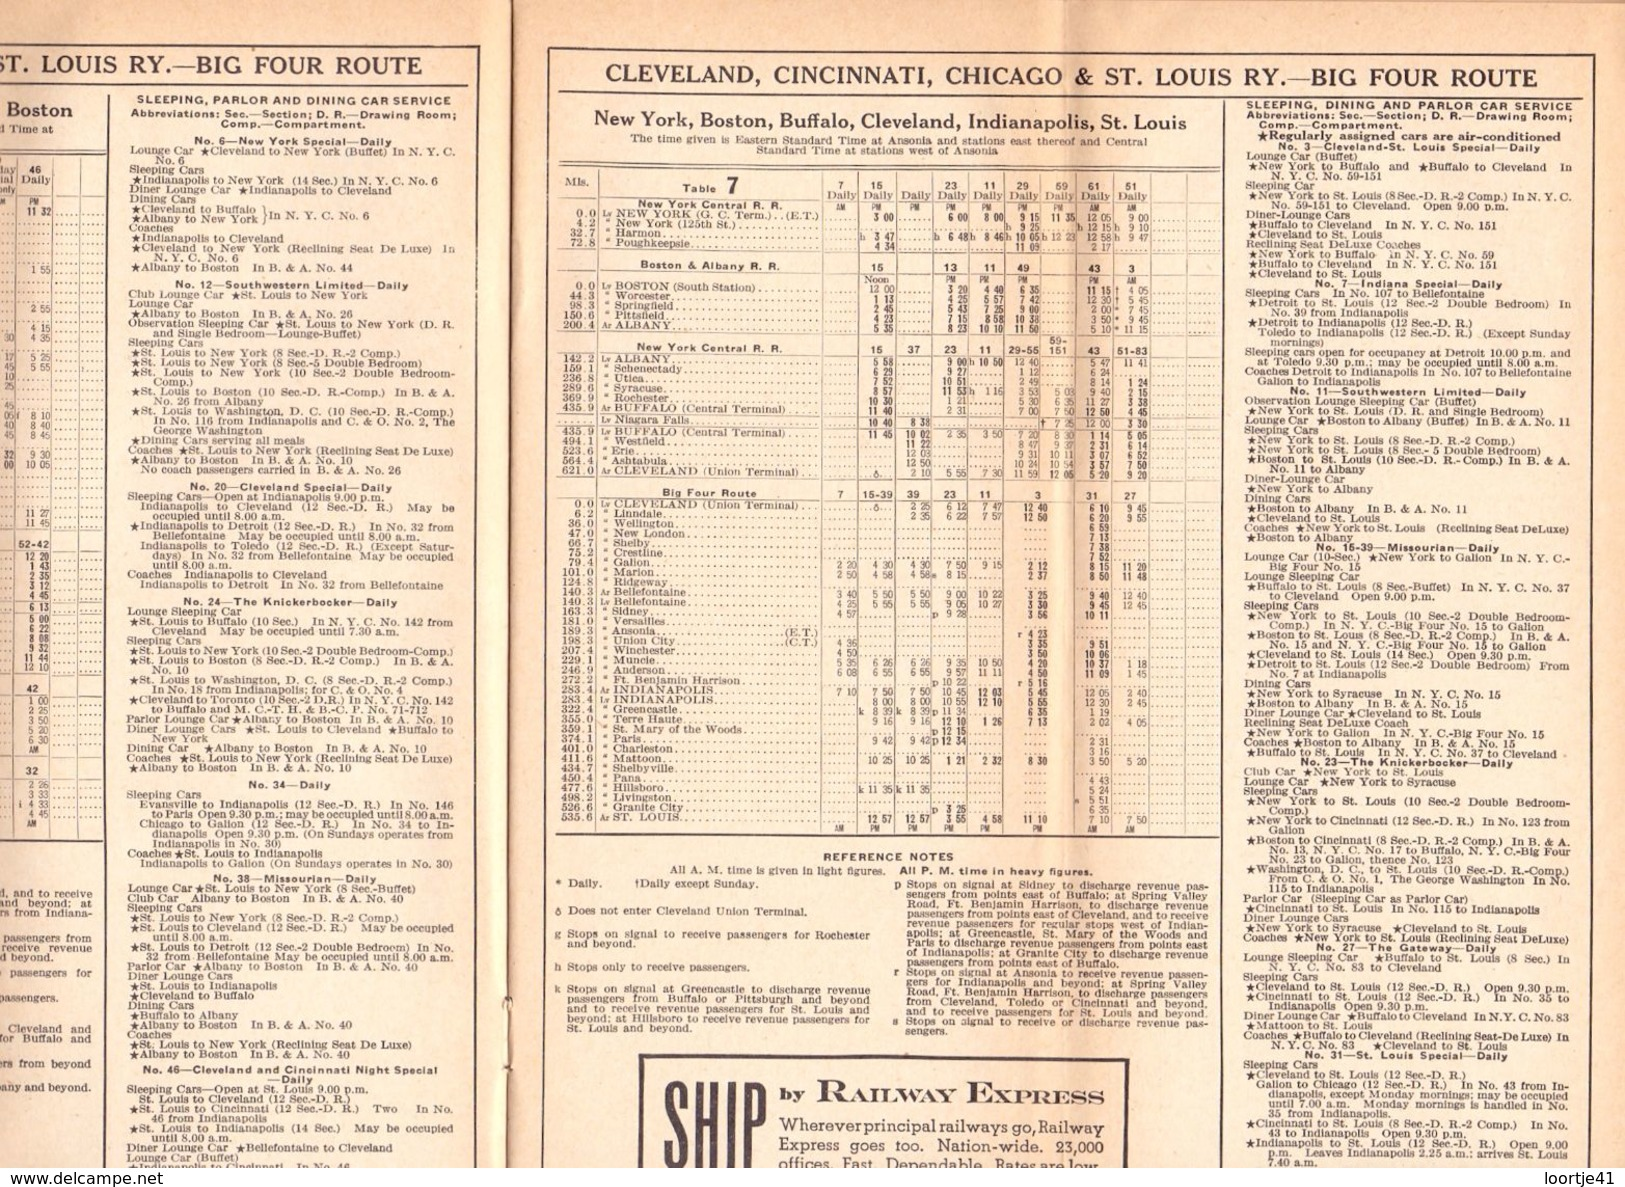 Toerisme Tourisme - Time Tables March 1938 - Trains New York Central System - Dienstregeling Treinen - World